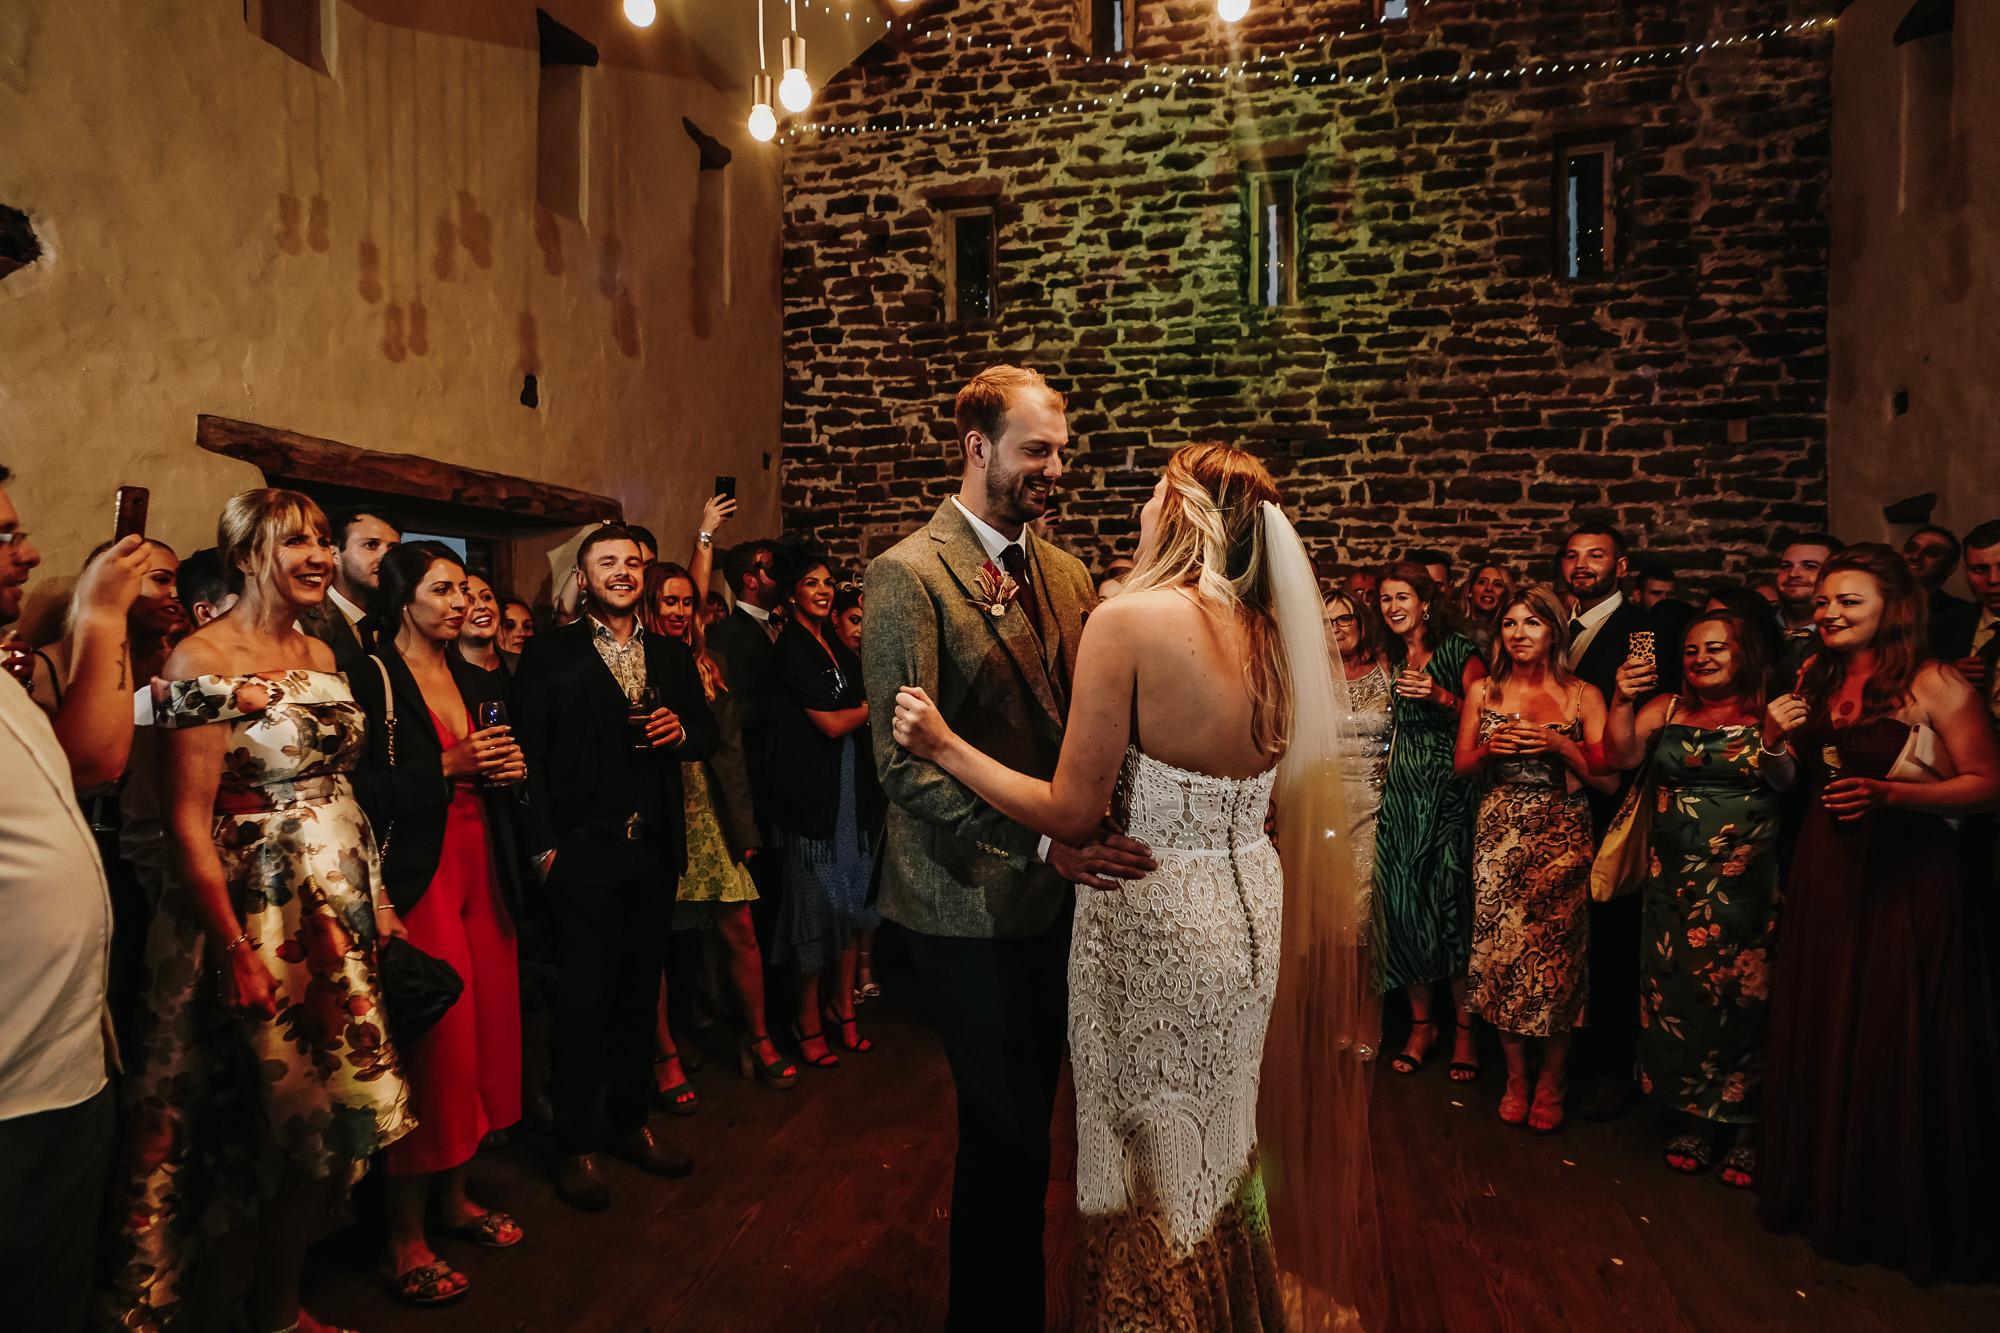 High Barn Wedding photographer lake distect penrith documentry wedding photography (54 of 57).jpg